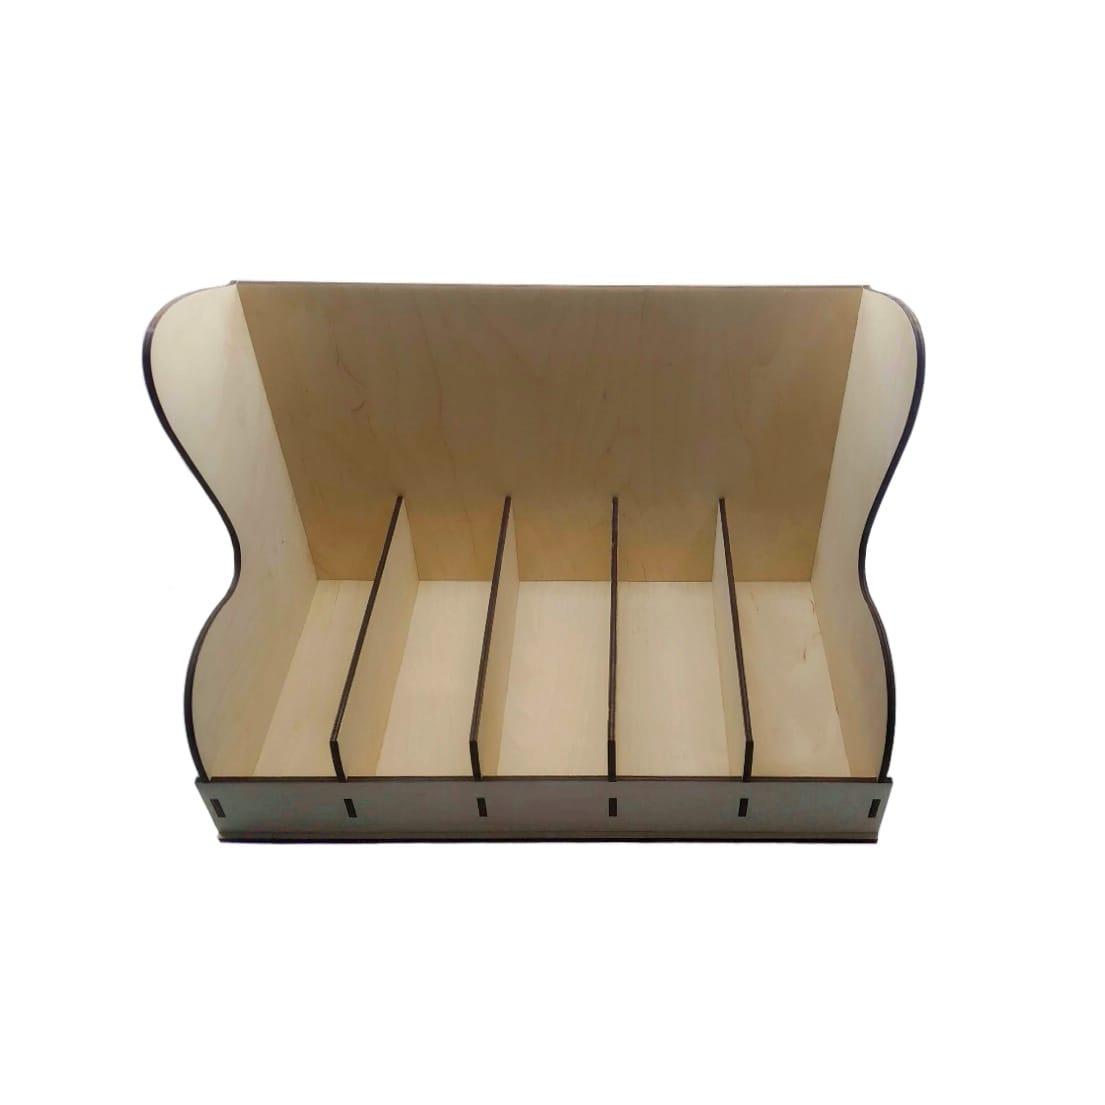 Laser Cut Coffee Cup Organizer Storage Rack Free Vector